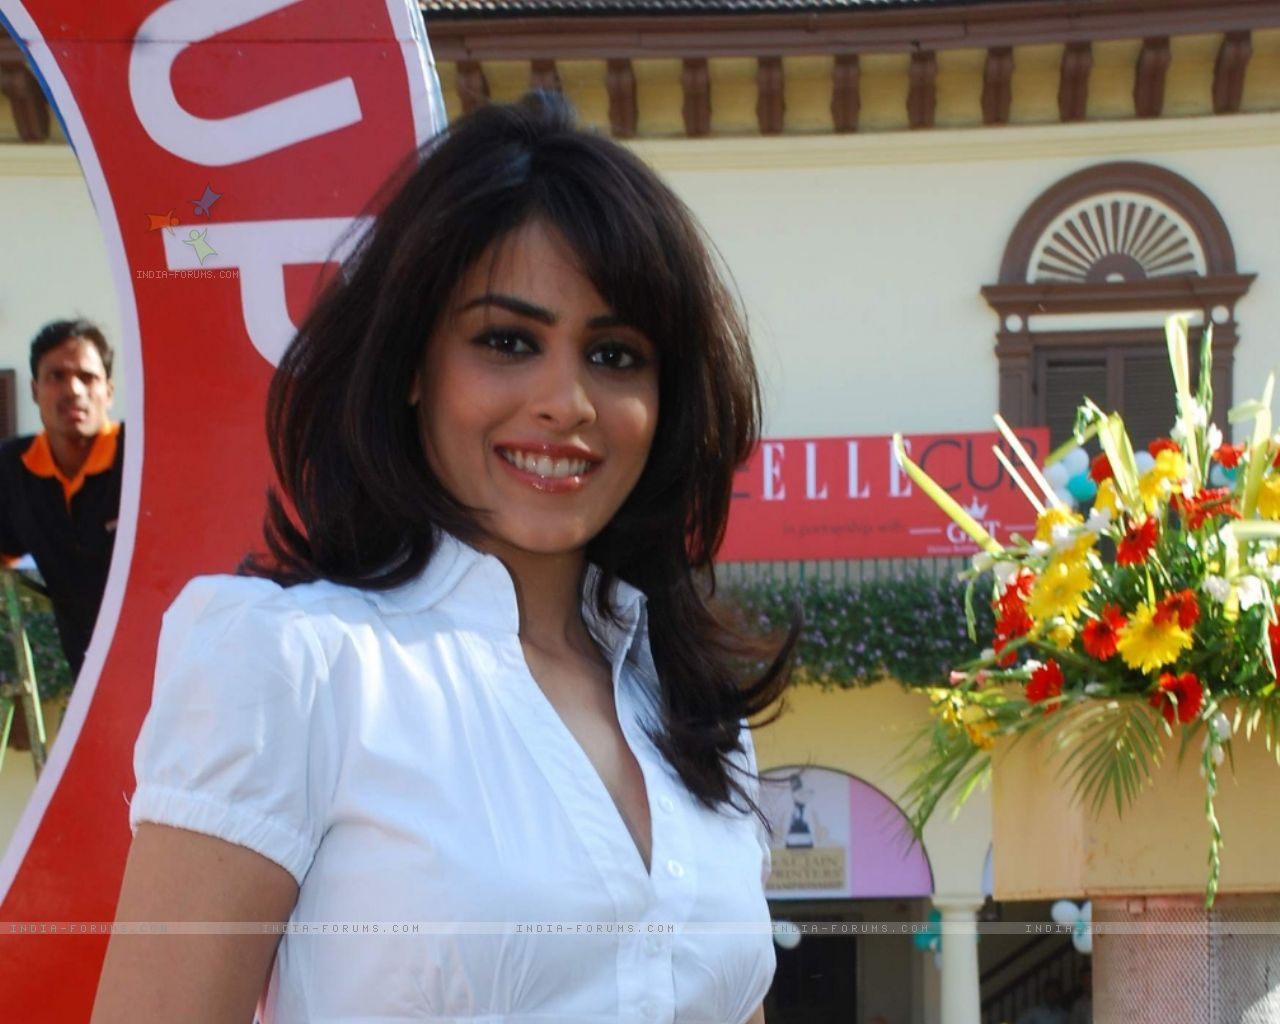 Top Hd Bollywood Wallapers hd bollywood wallpapers actress 1280x1024